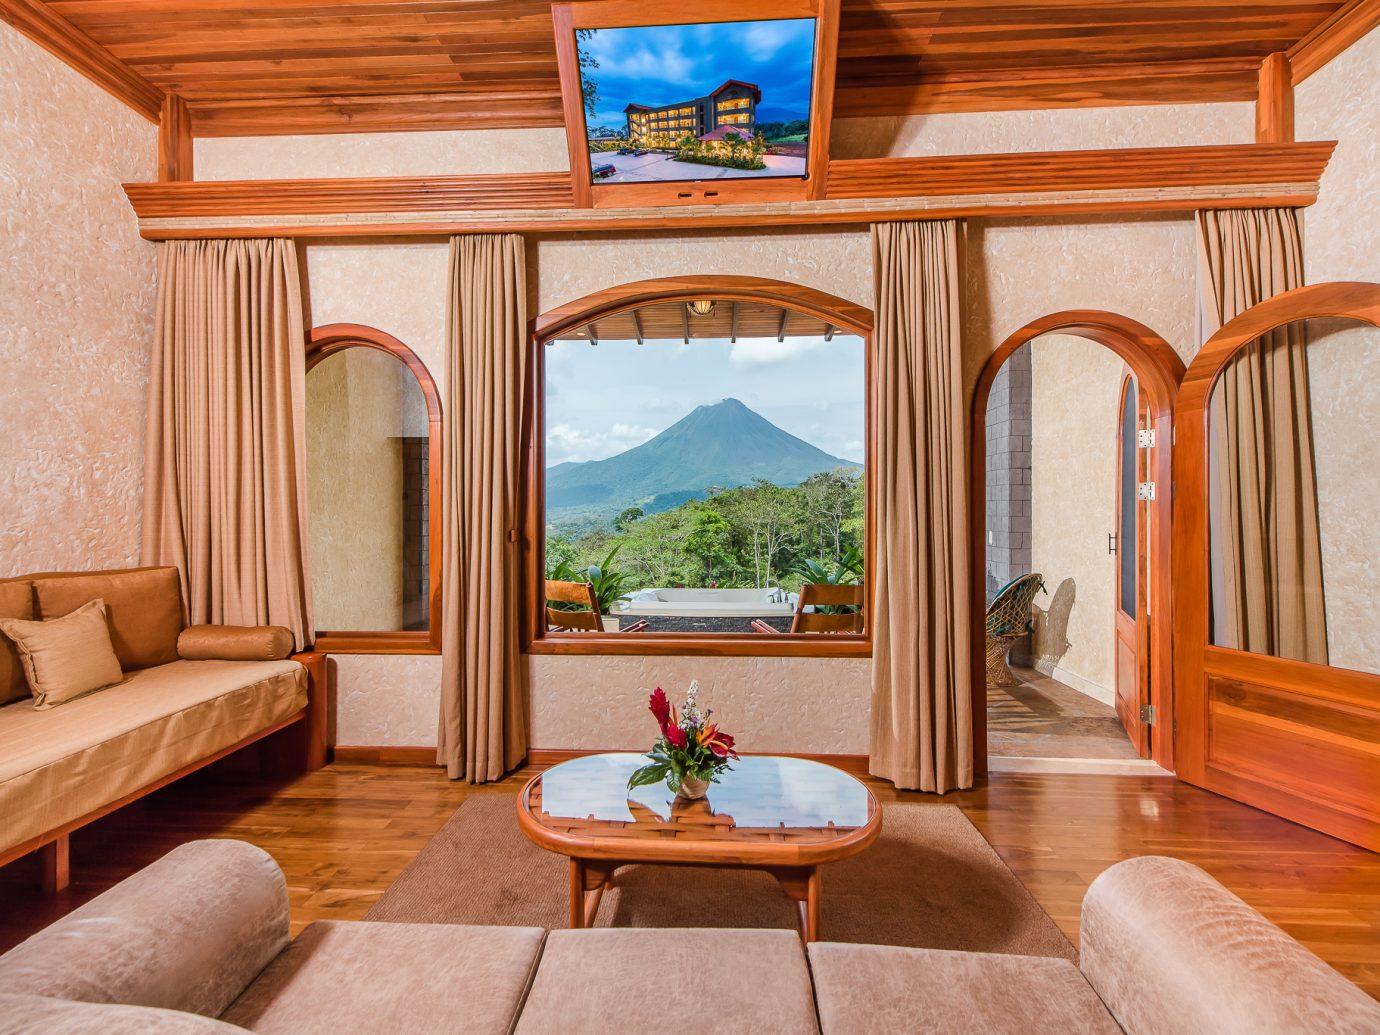 Living room of the Honeymoon Grande Vista